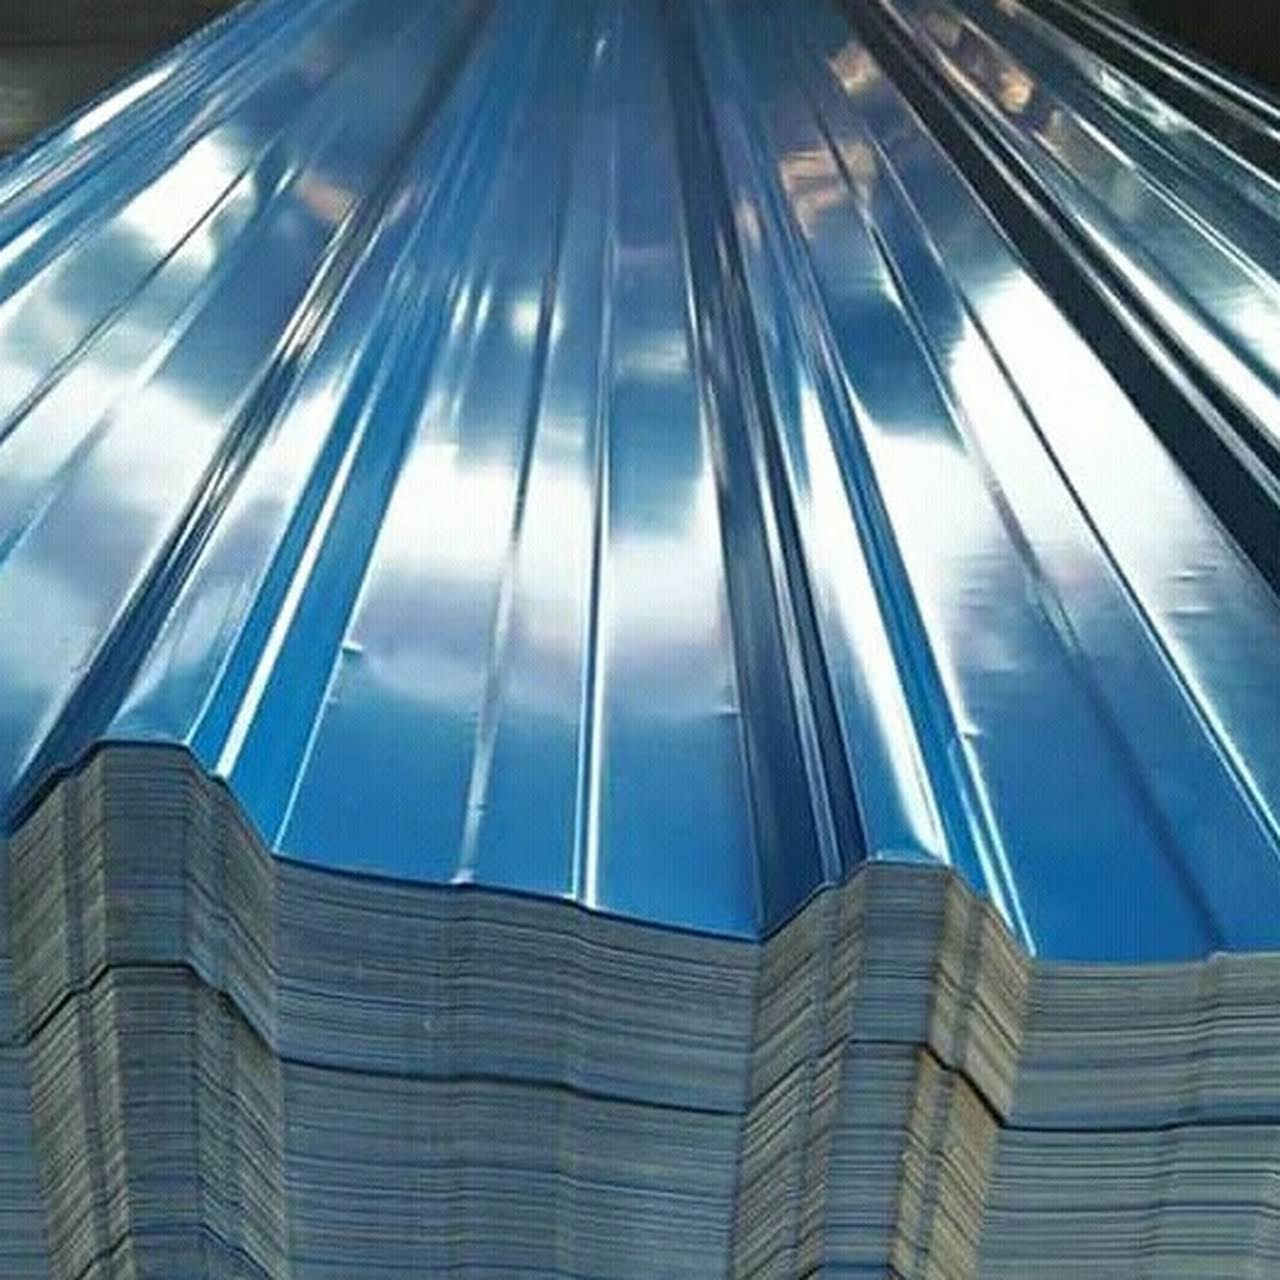 Harga Atap Spandek Warna Biru